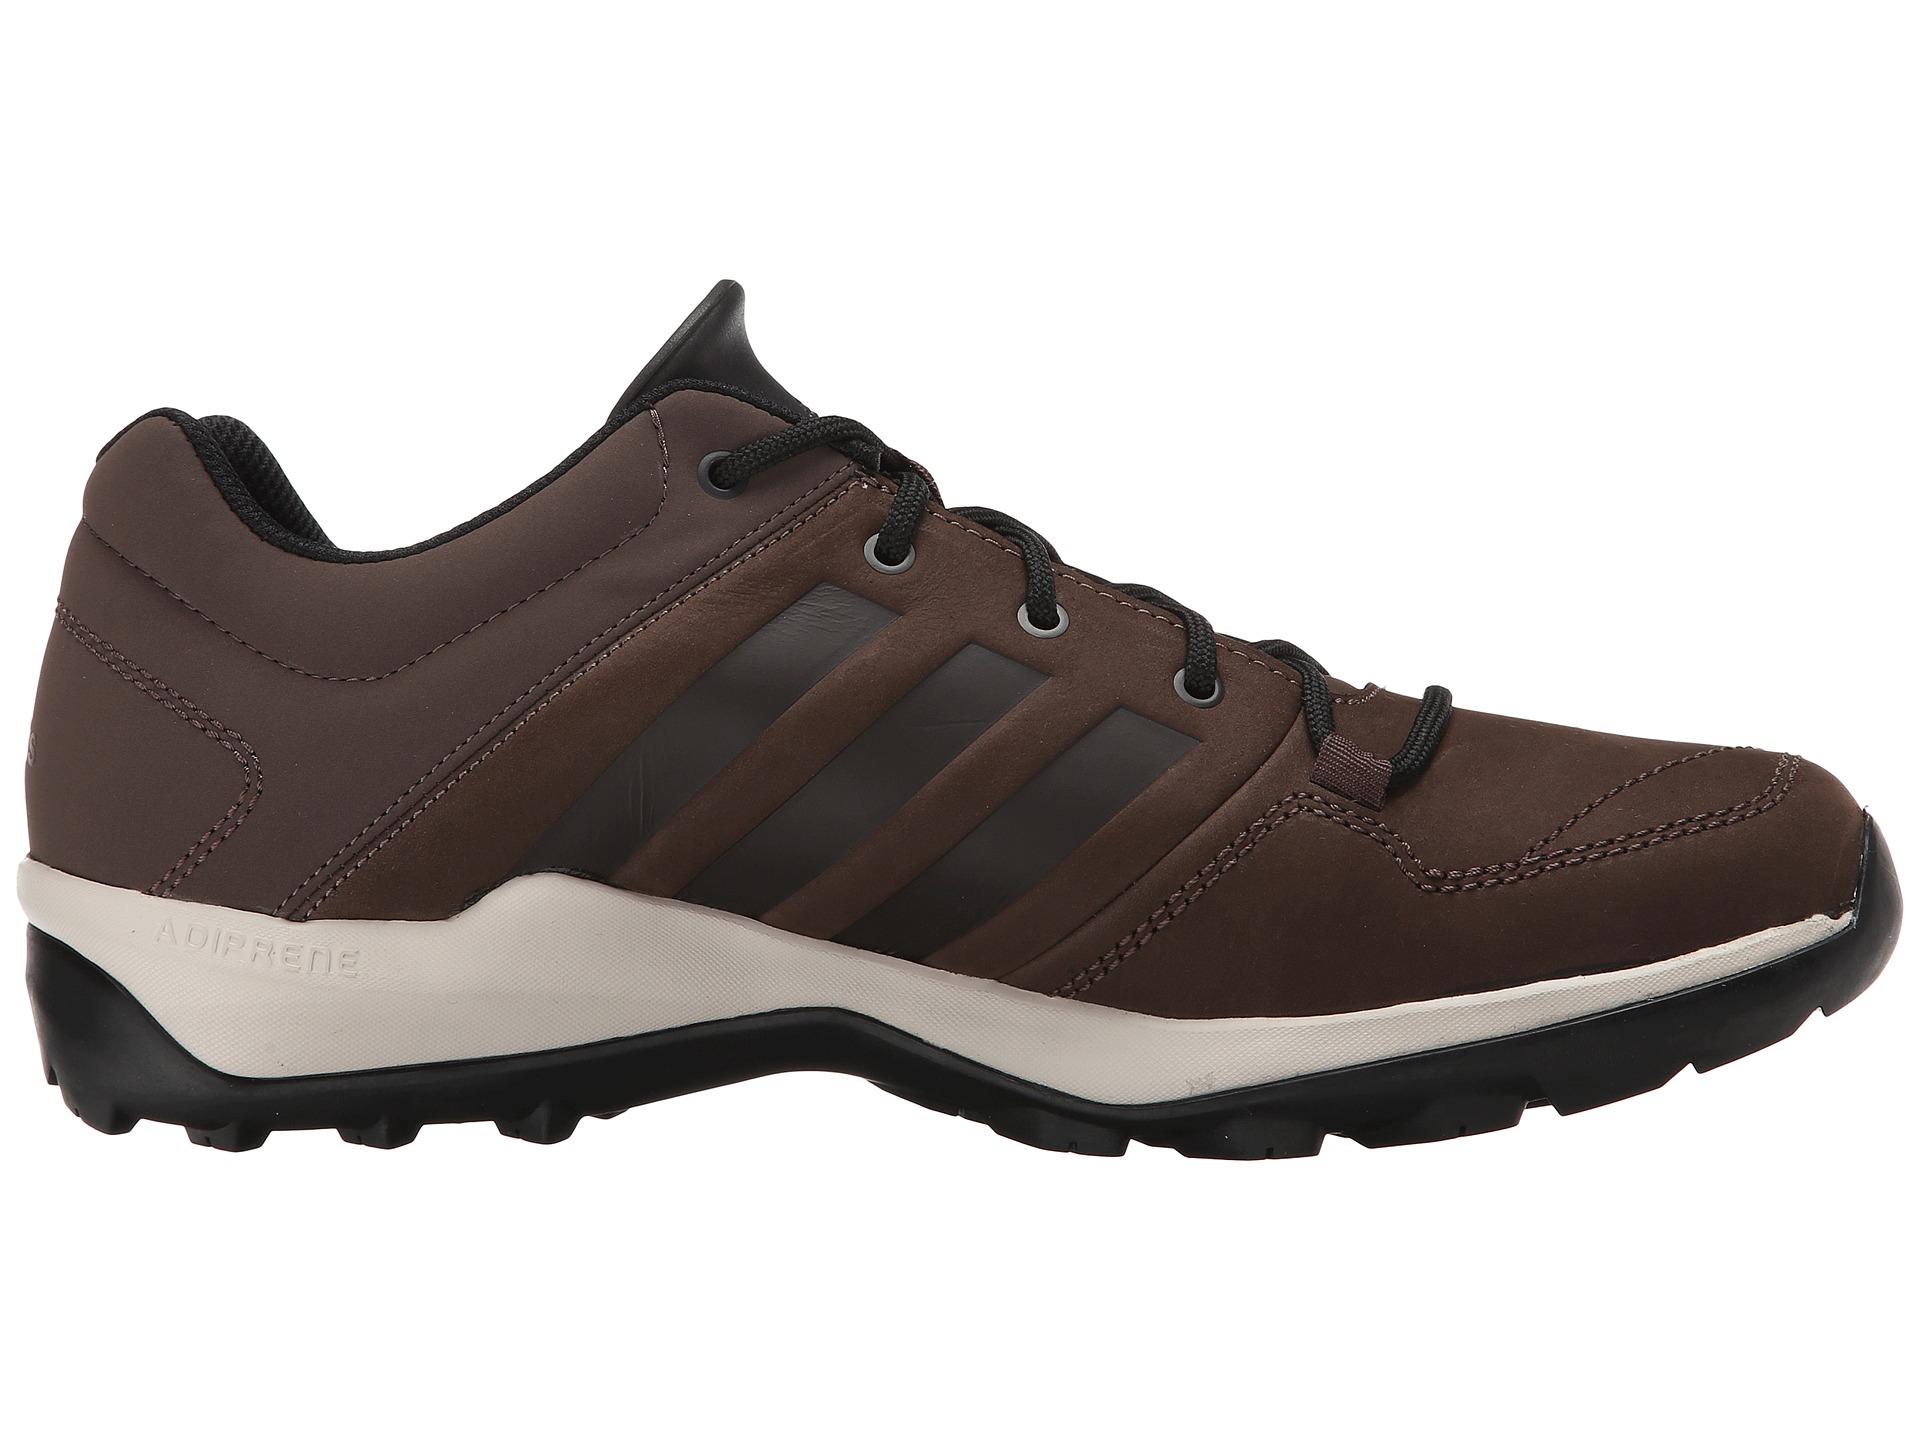 online retailer 5b786 74fff Lyst - adidas Daroga Plus Leather in Brown for Men